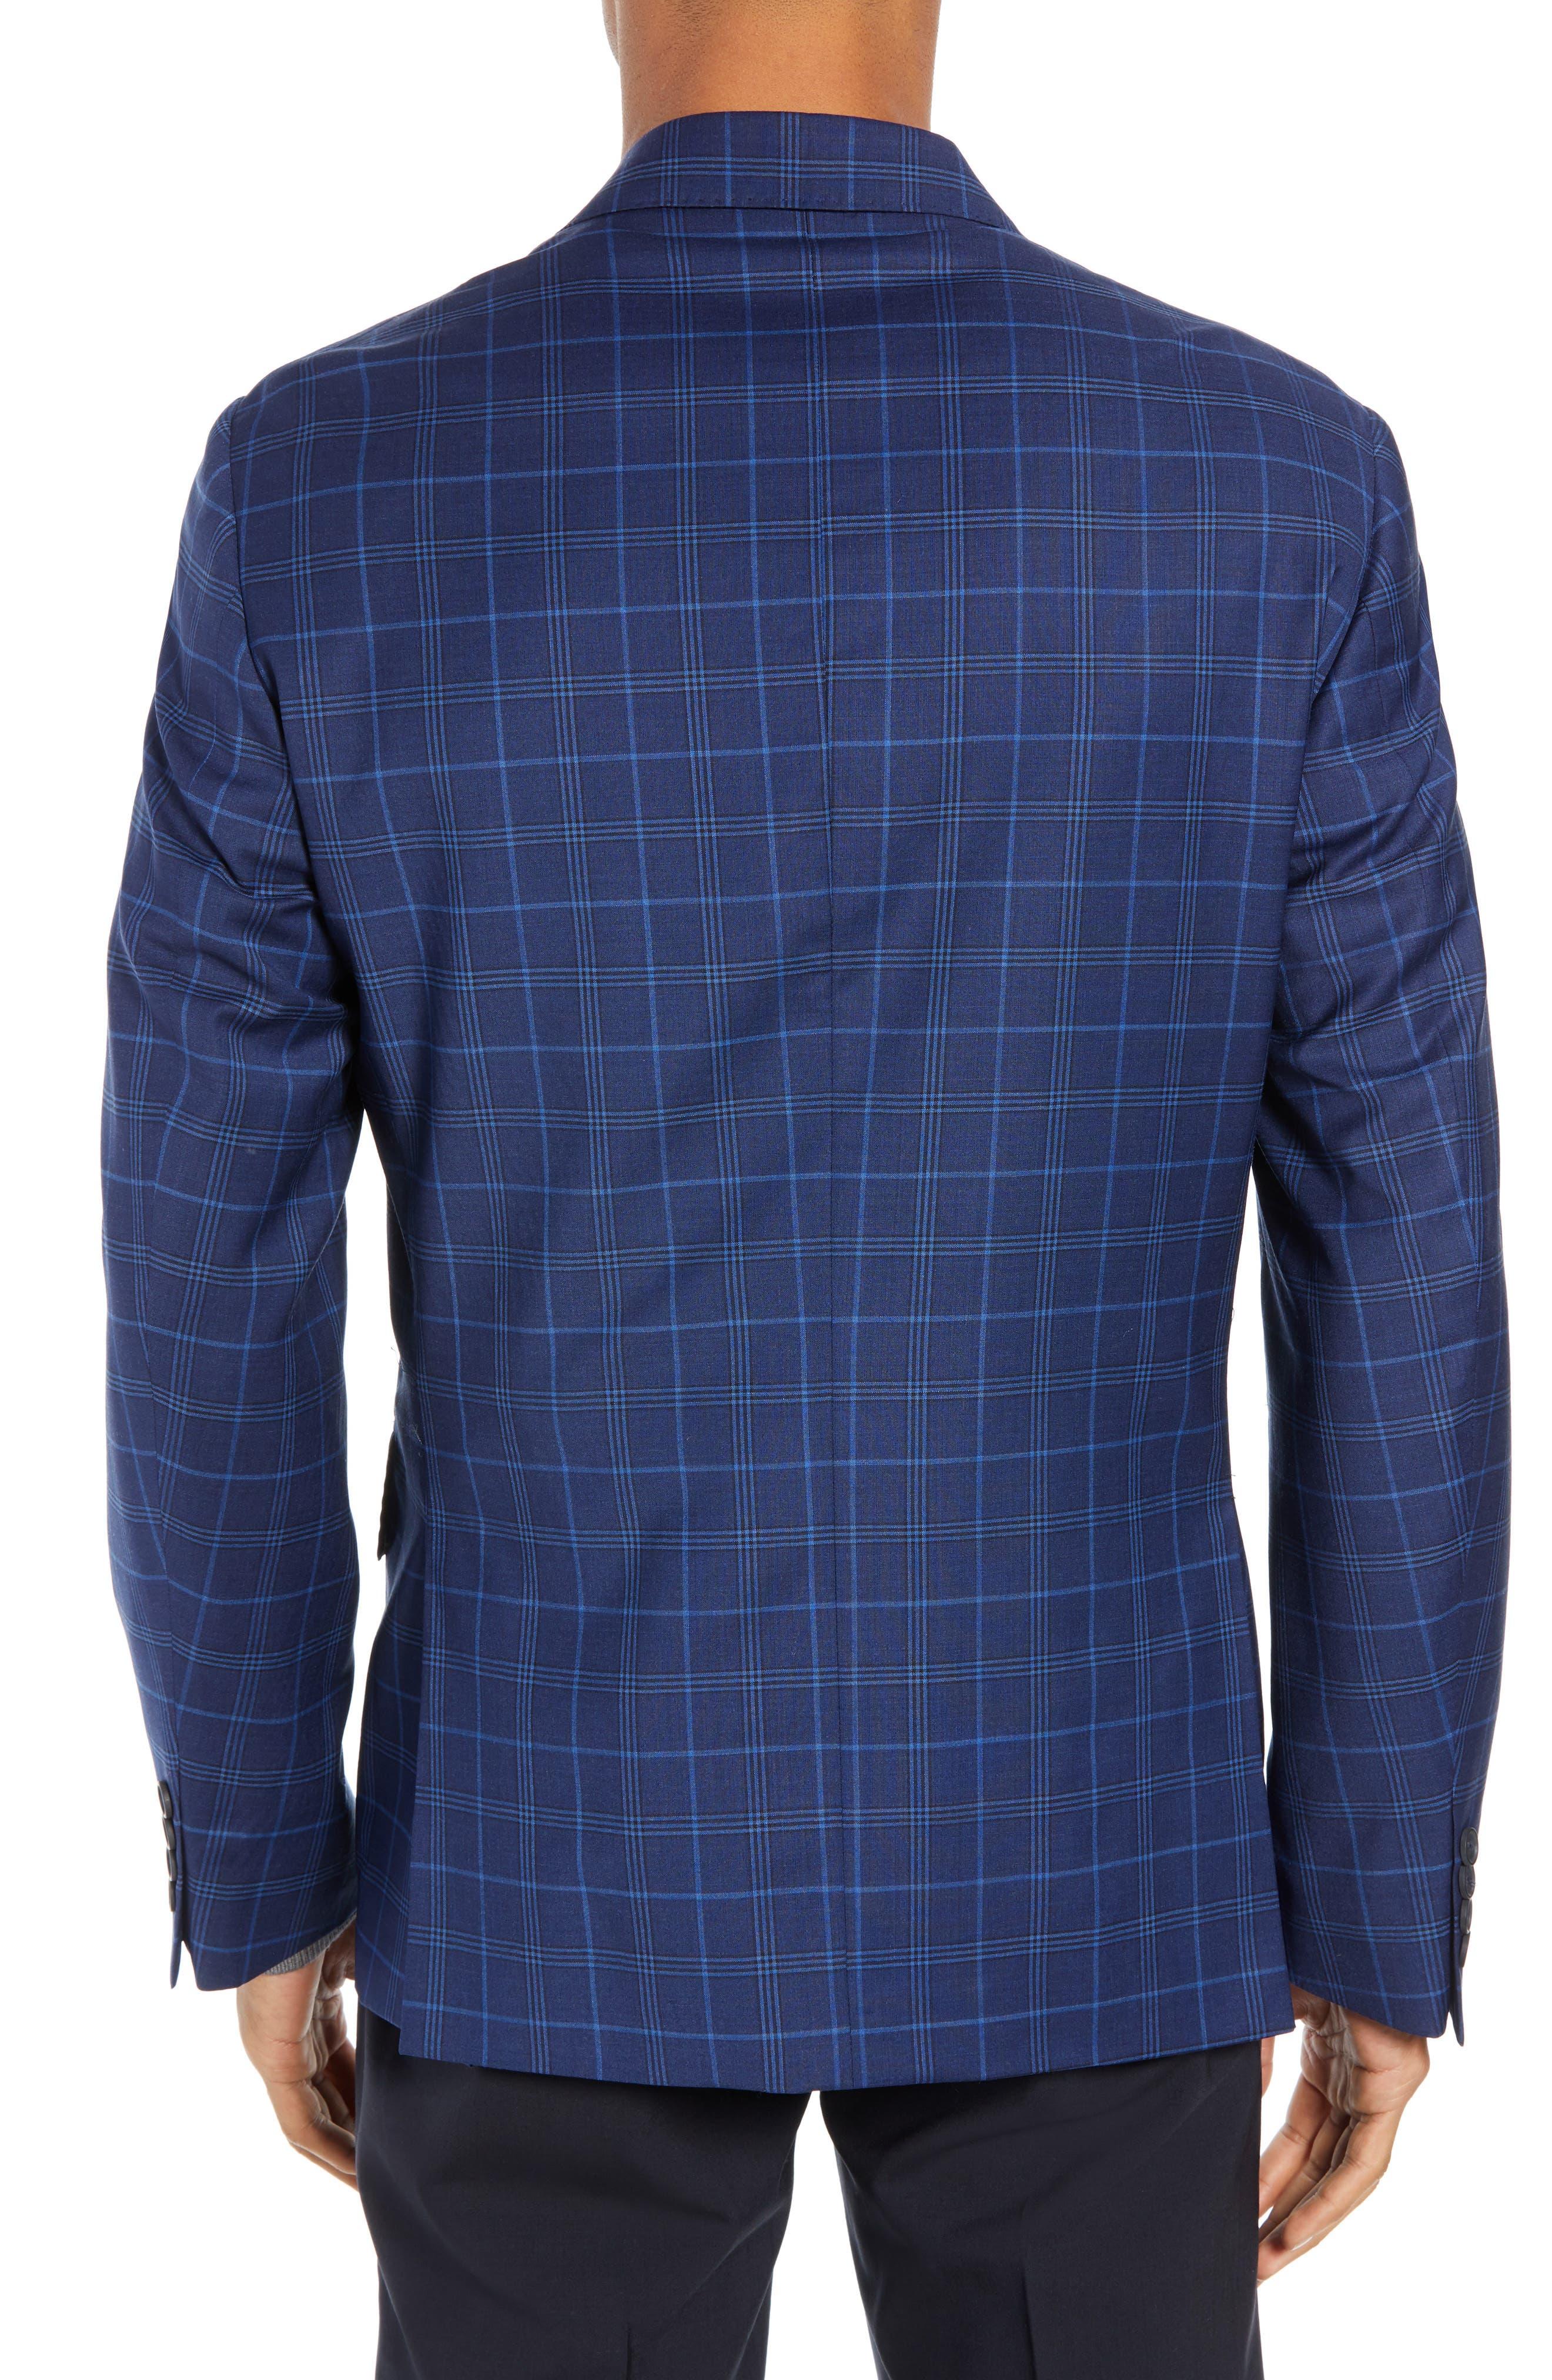 JOHN W. NORDSTROM<SUP>®</SUP>, Traditional Fit Plaid Wool Sport Coat, Alternate thumbnail 2, color, NAVY IRIS BLUE WINDOWPANE